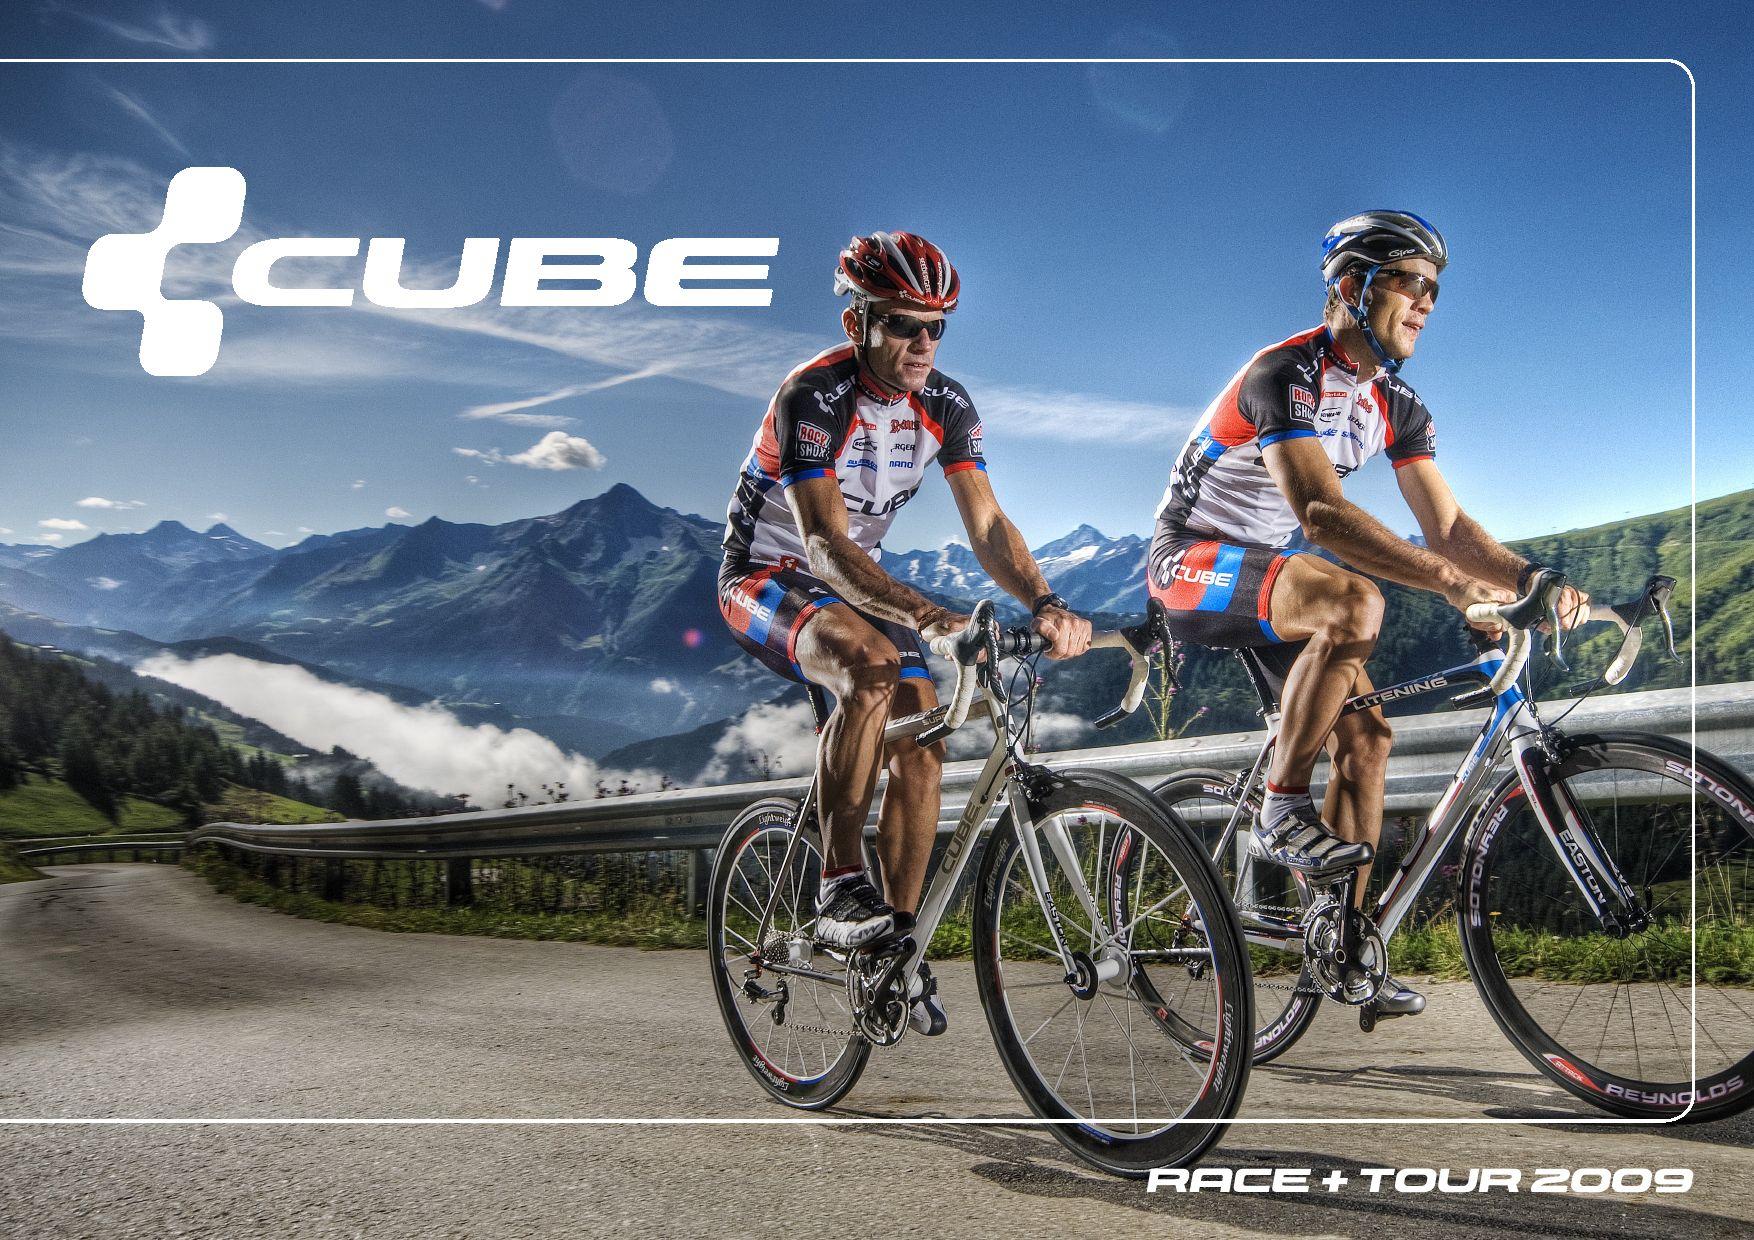 cube race tour 2009 by werbeagentur 4c media issuu. Black Bedroom Furniture Sets. Home Design Ideas